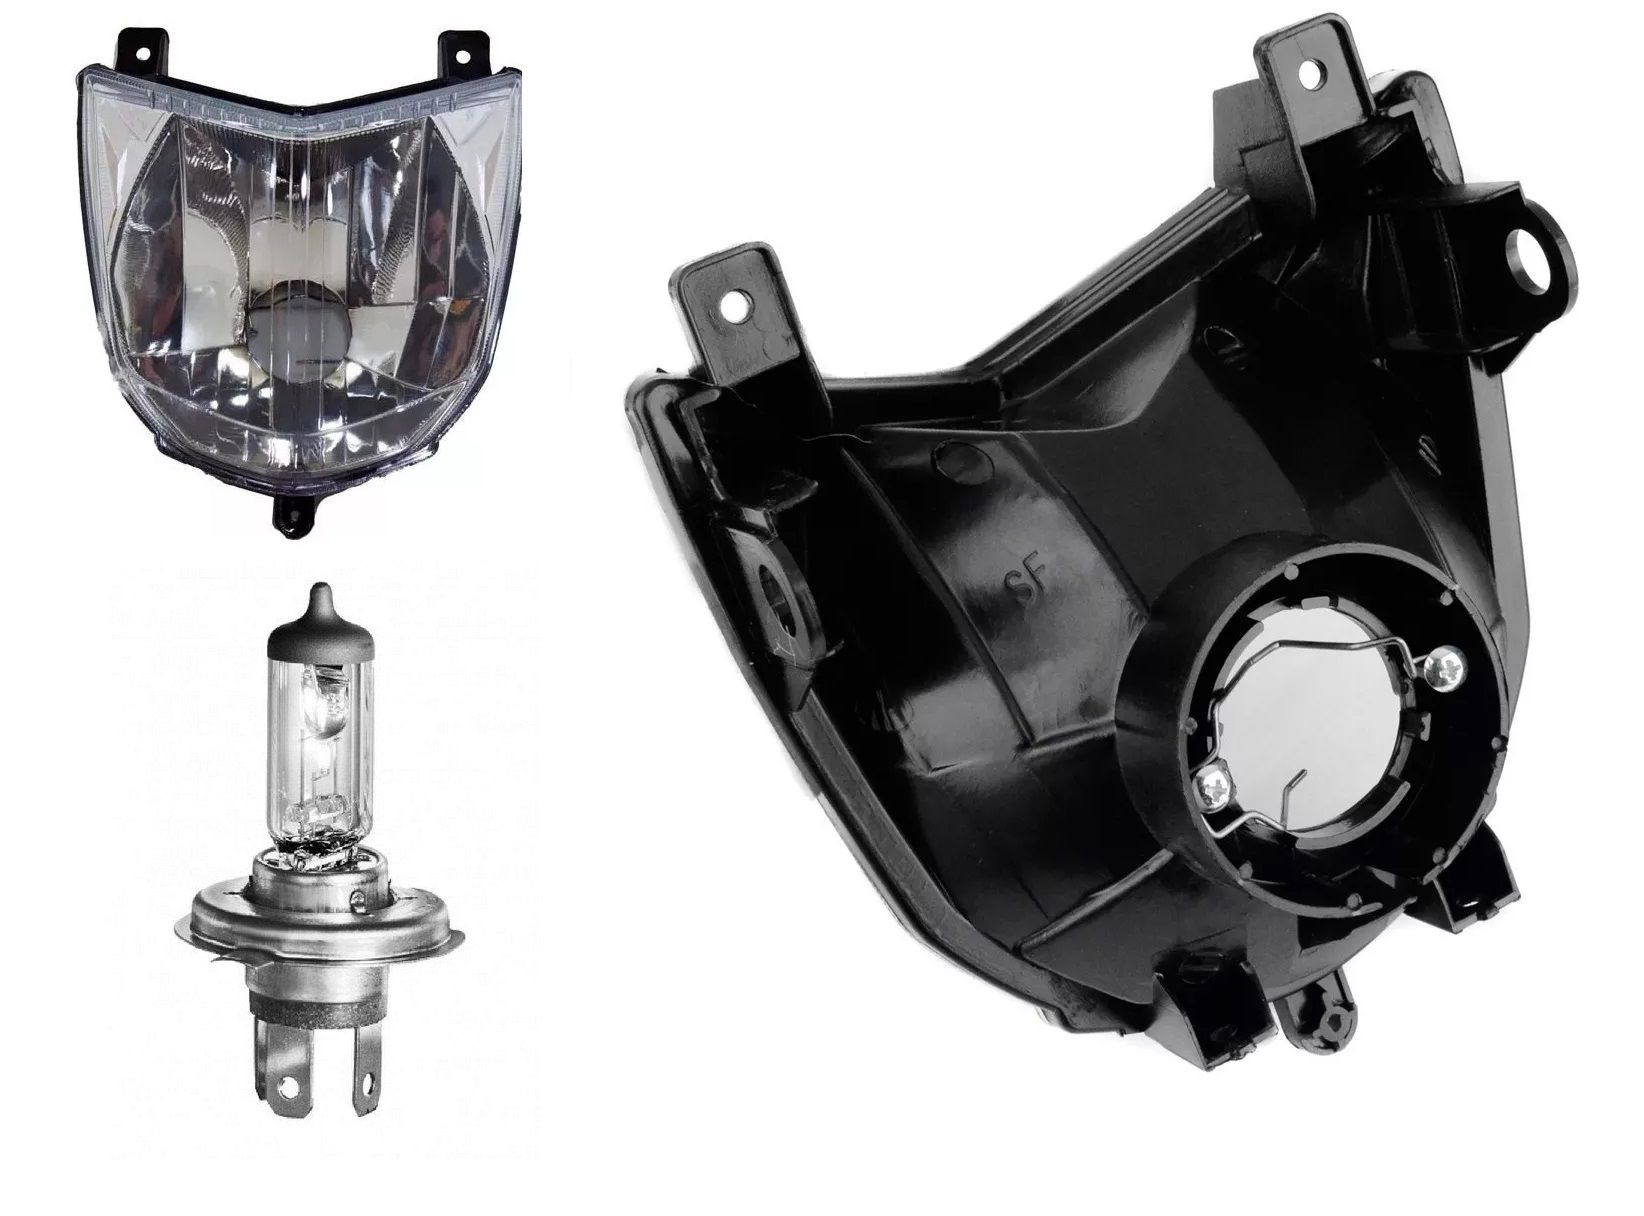 Farol Completo Yamaha Xtz 250 Lander Modelo Original + Lampada